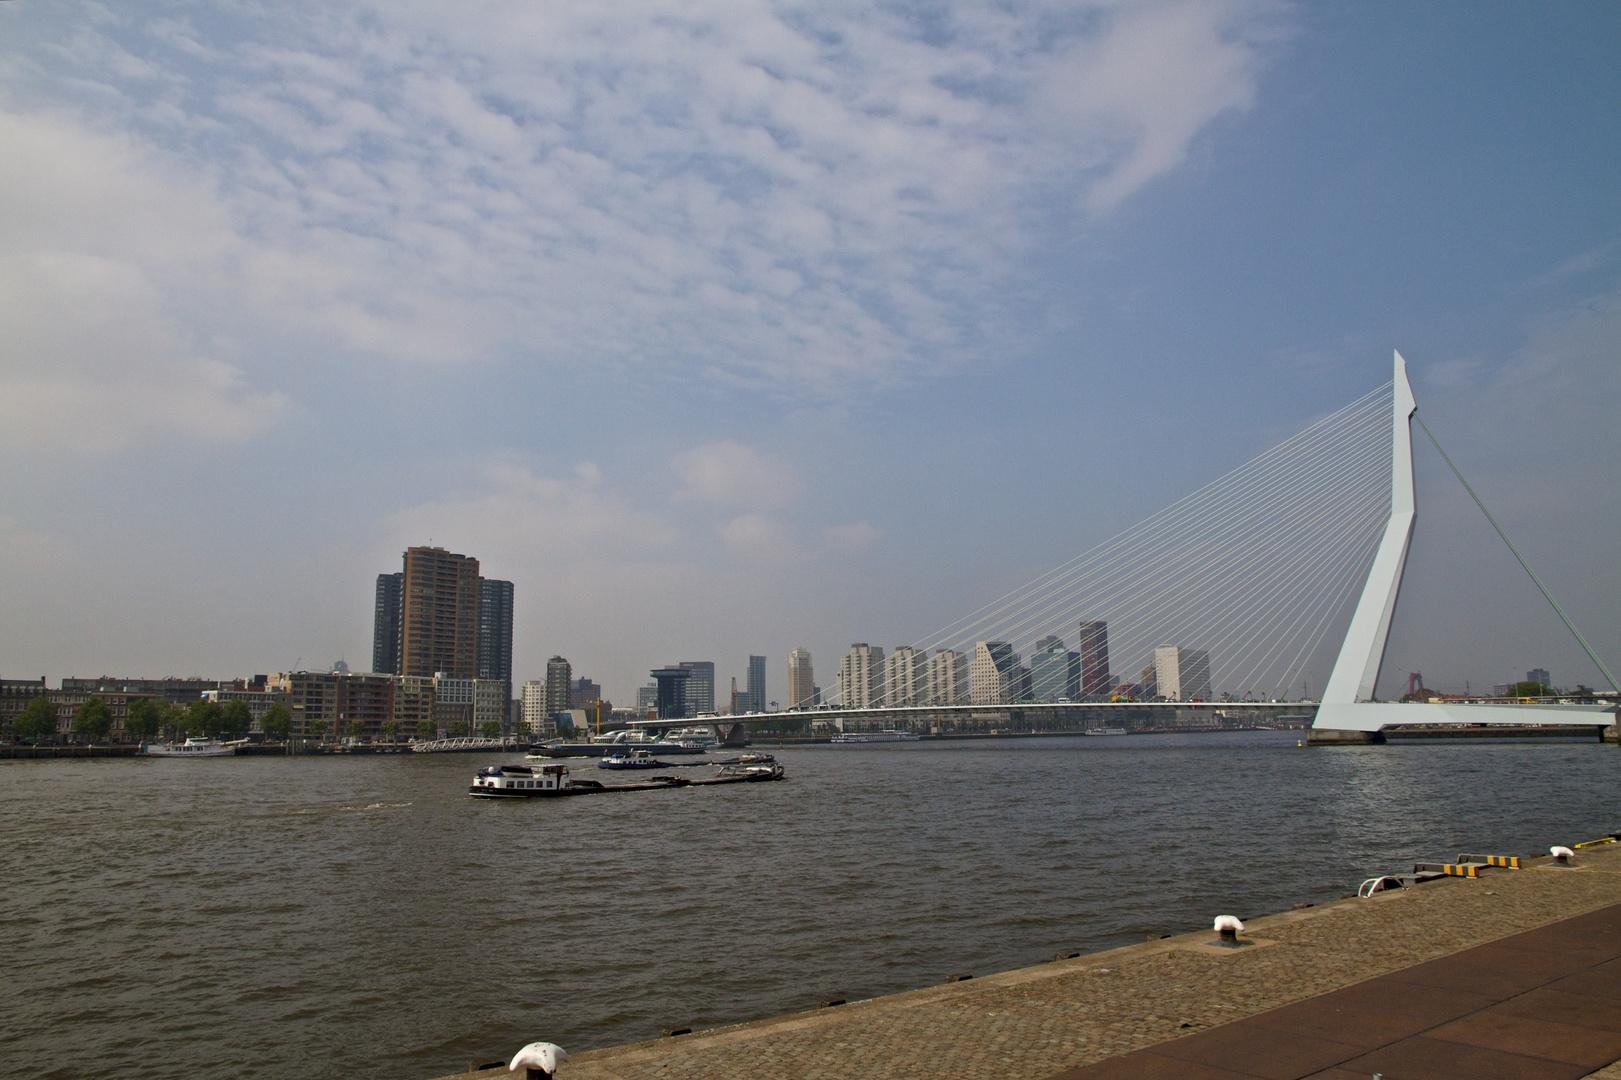 Rotterdam City Harbour